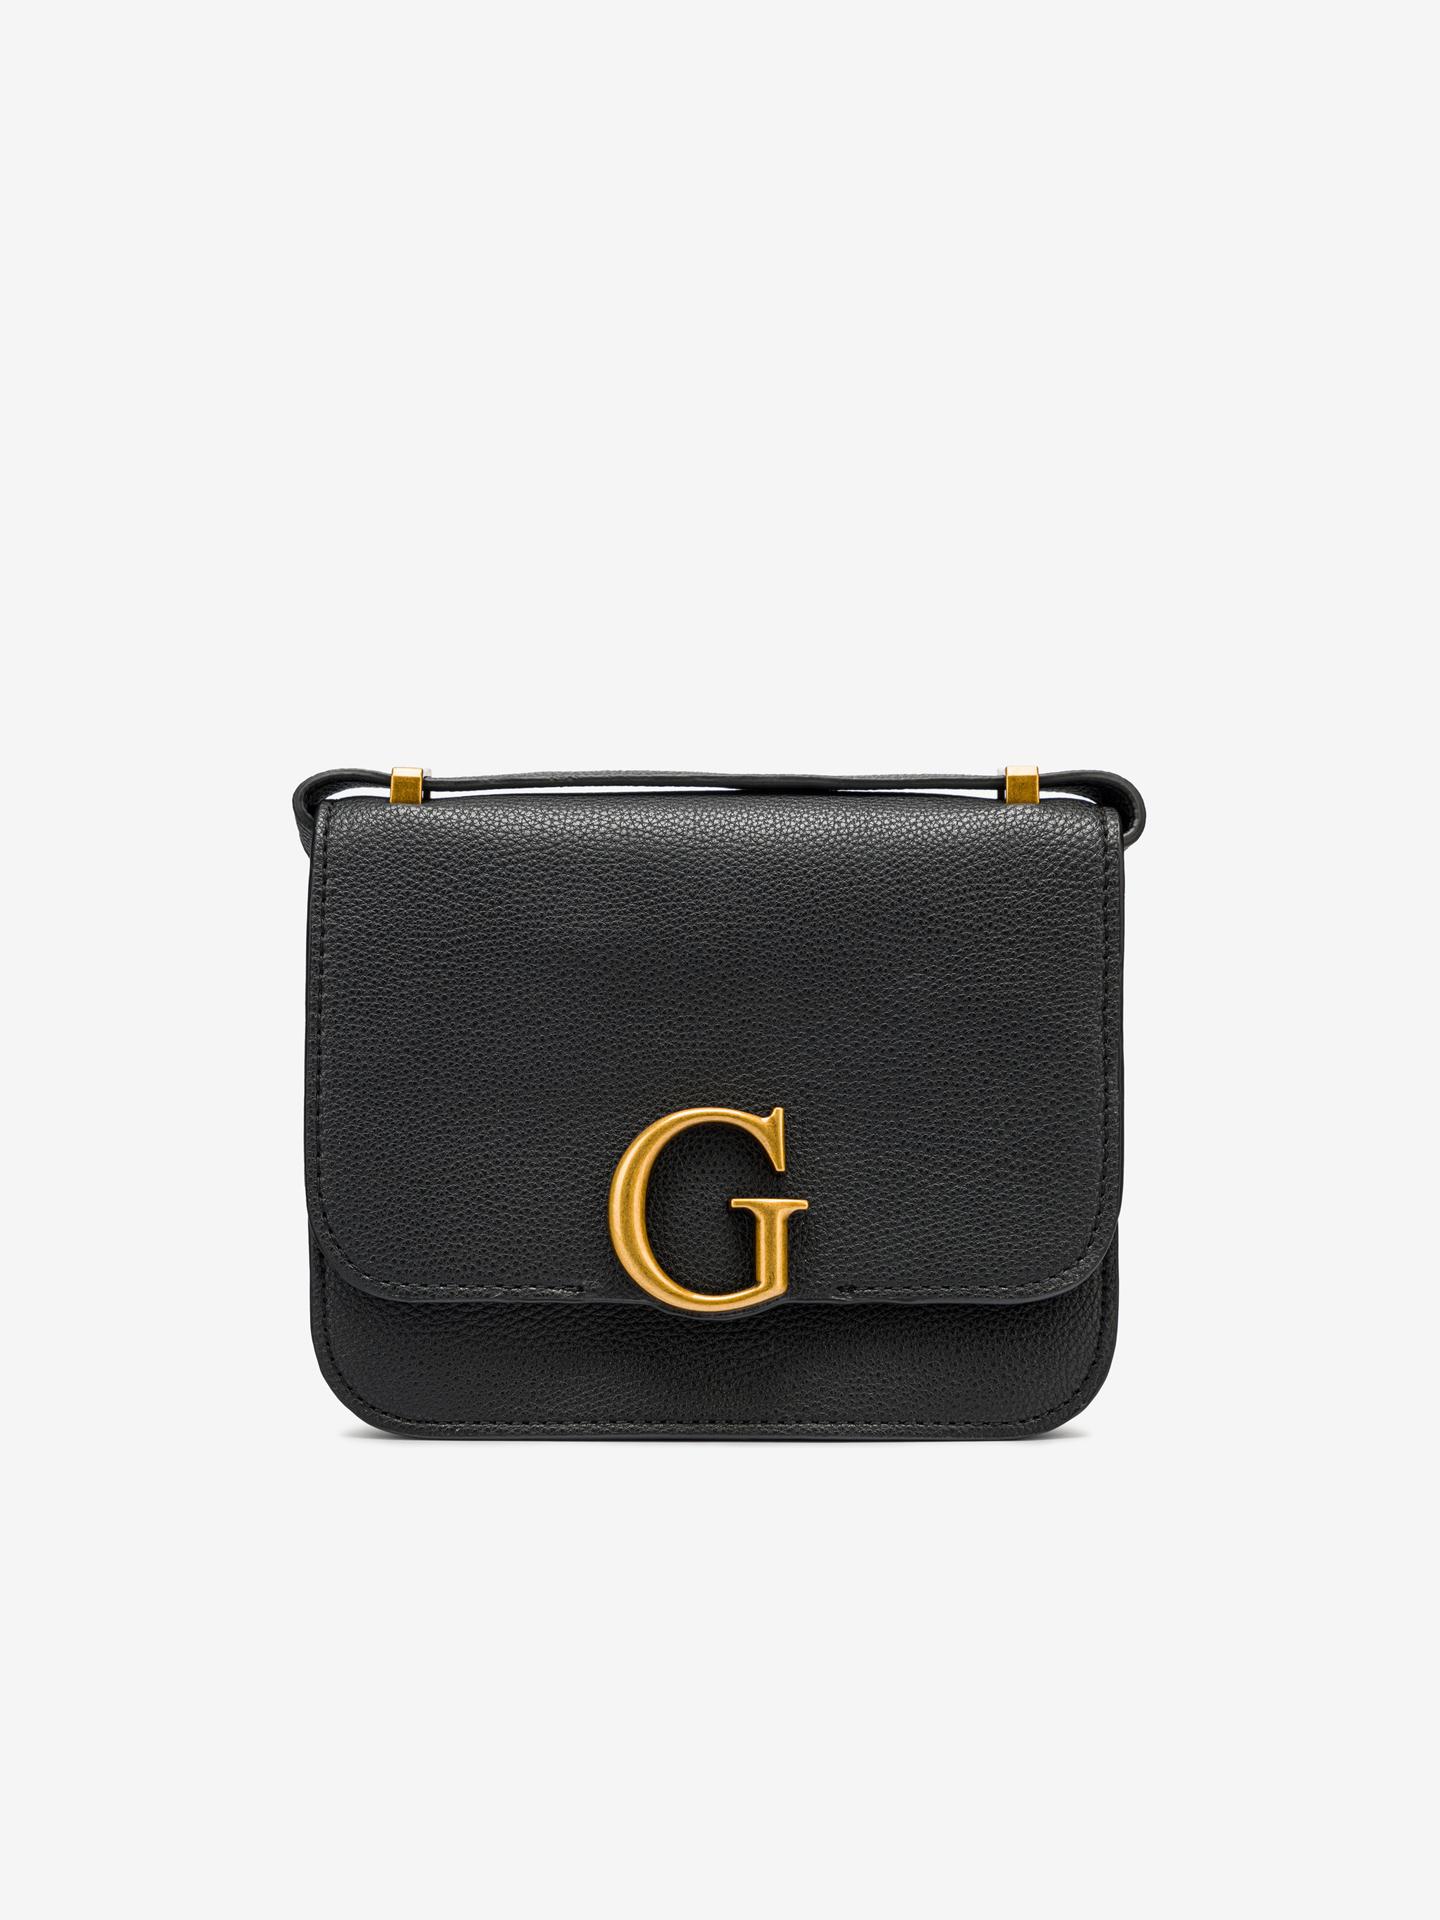 Guess black crossbody handbag Corily